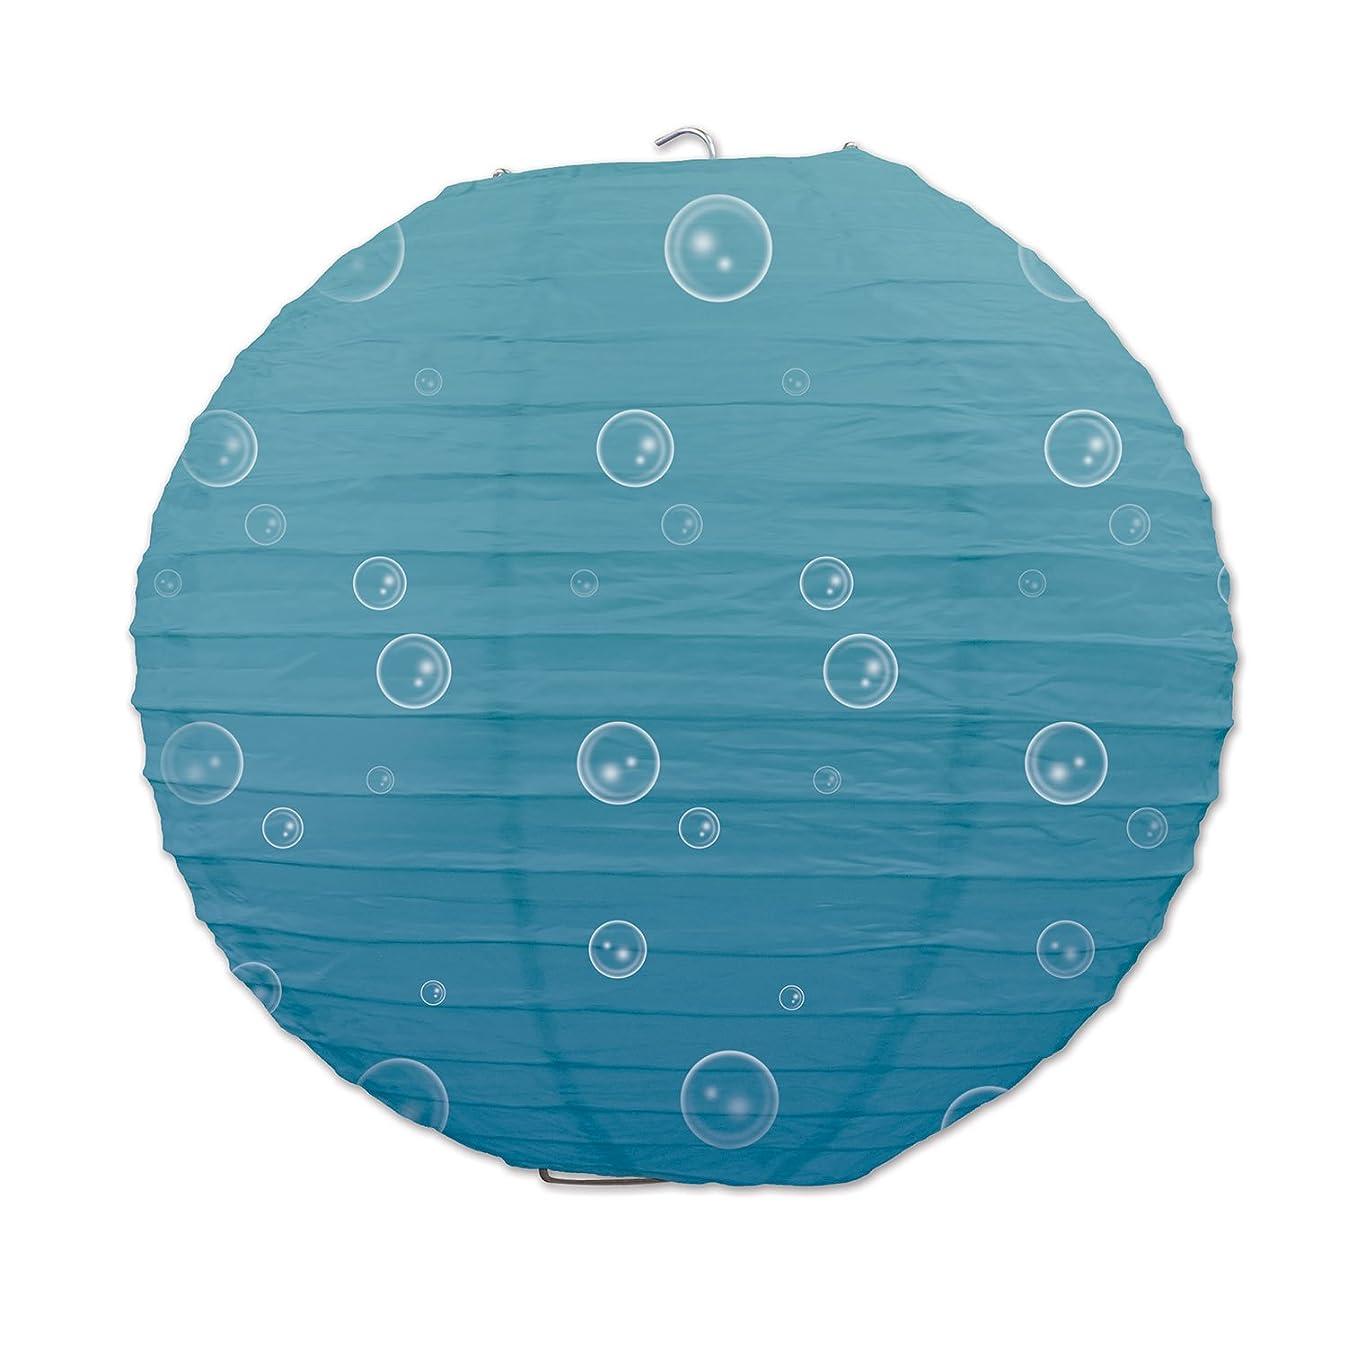 Beistle 54061 Under the Sea Paper Lanterns (3 Pack), 9.5